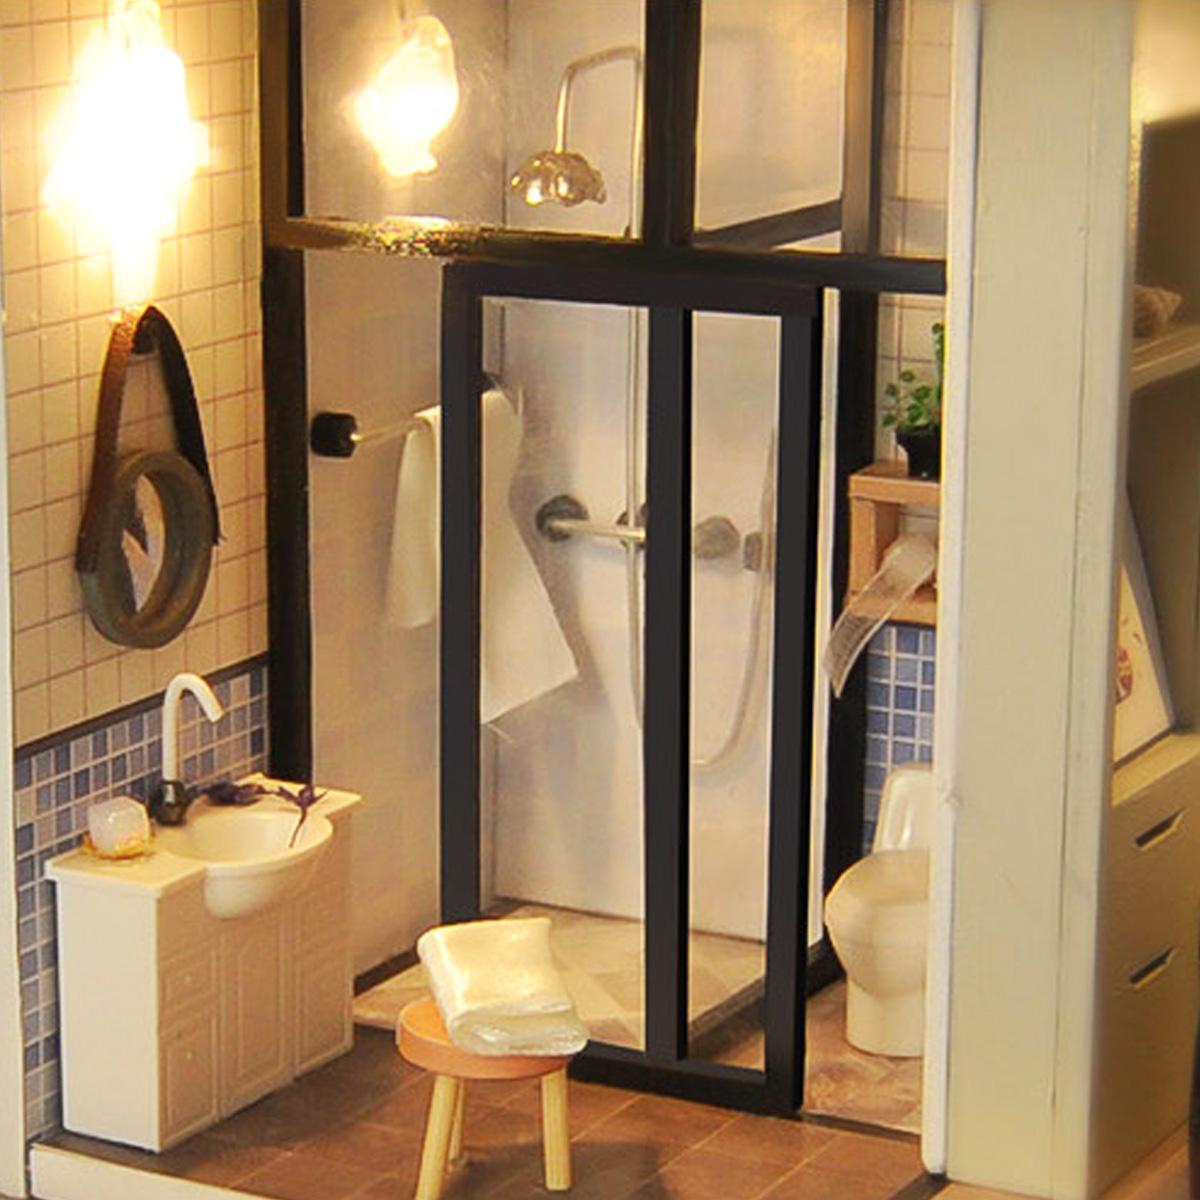 New Mini Cockloft DIY Doll House Miniatures Furniture Kit Kids Gift LED Light